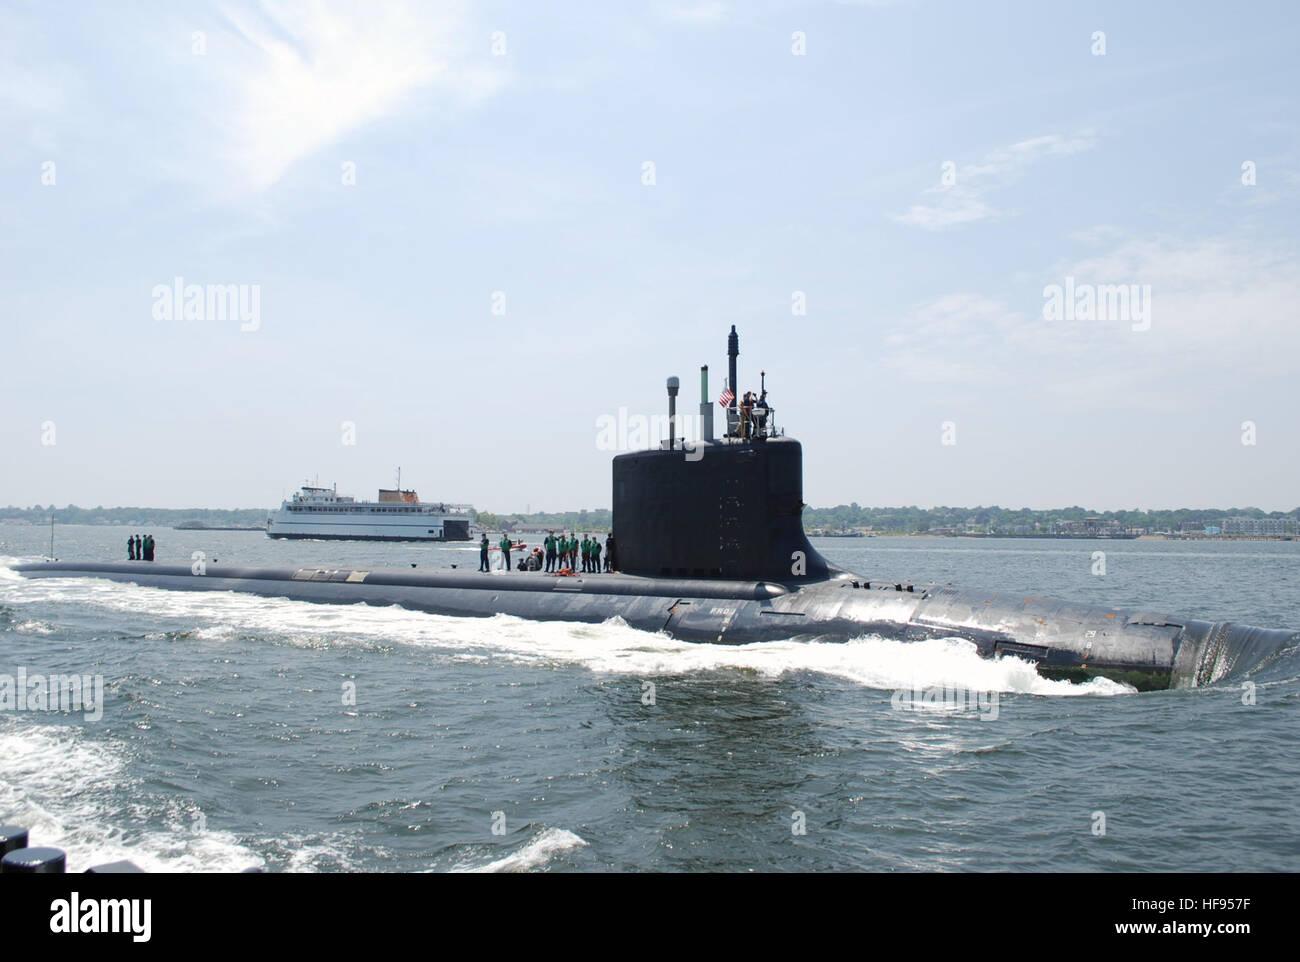 The Virginia-class attack submarine USS New Mexico (SSN 779